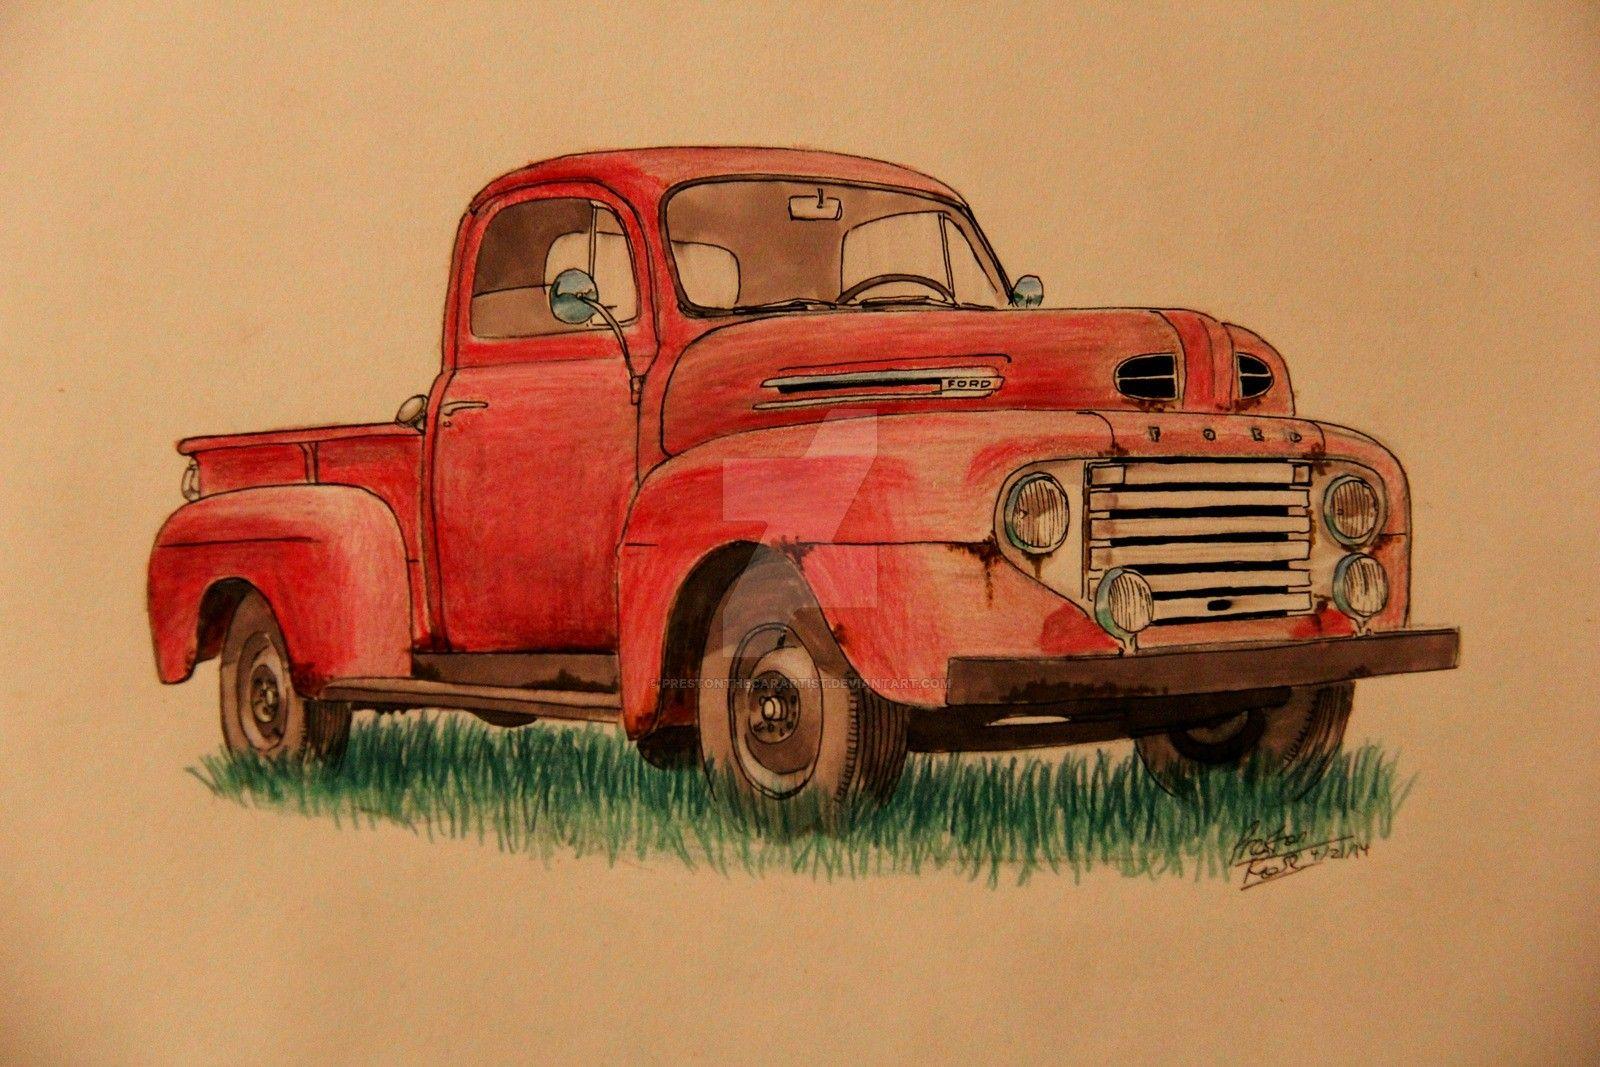 Pin de Jody Kincaid en Country Sketching | Pinterest